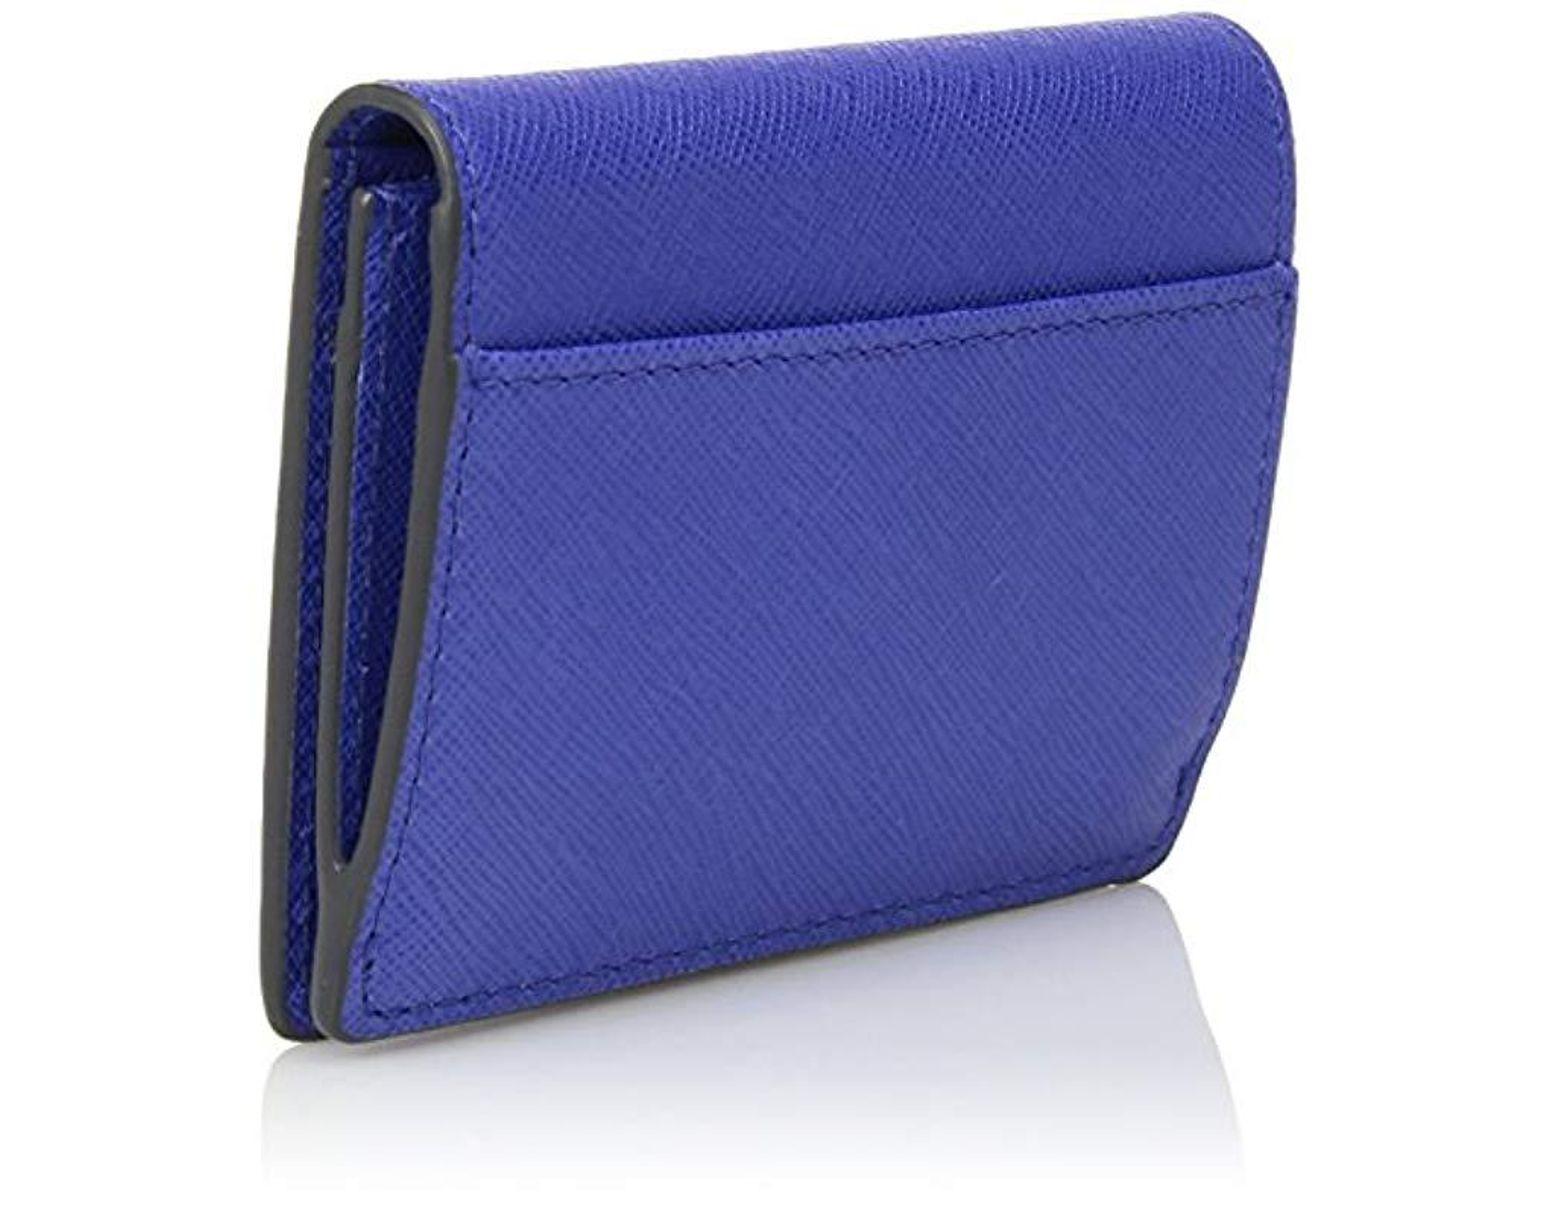 ad4bbd1218 Women's Blue Iola Card Case